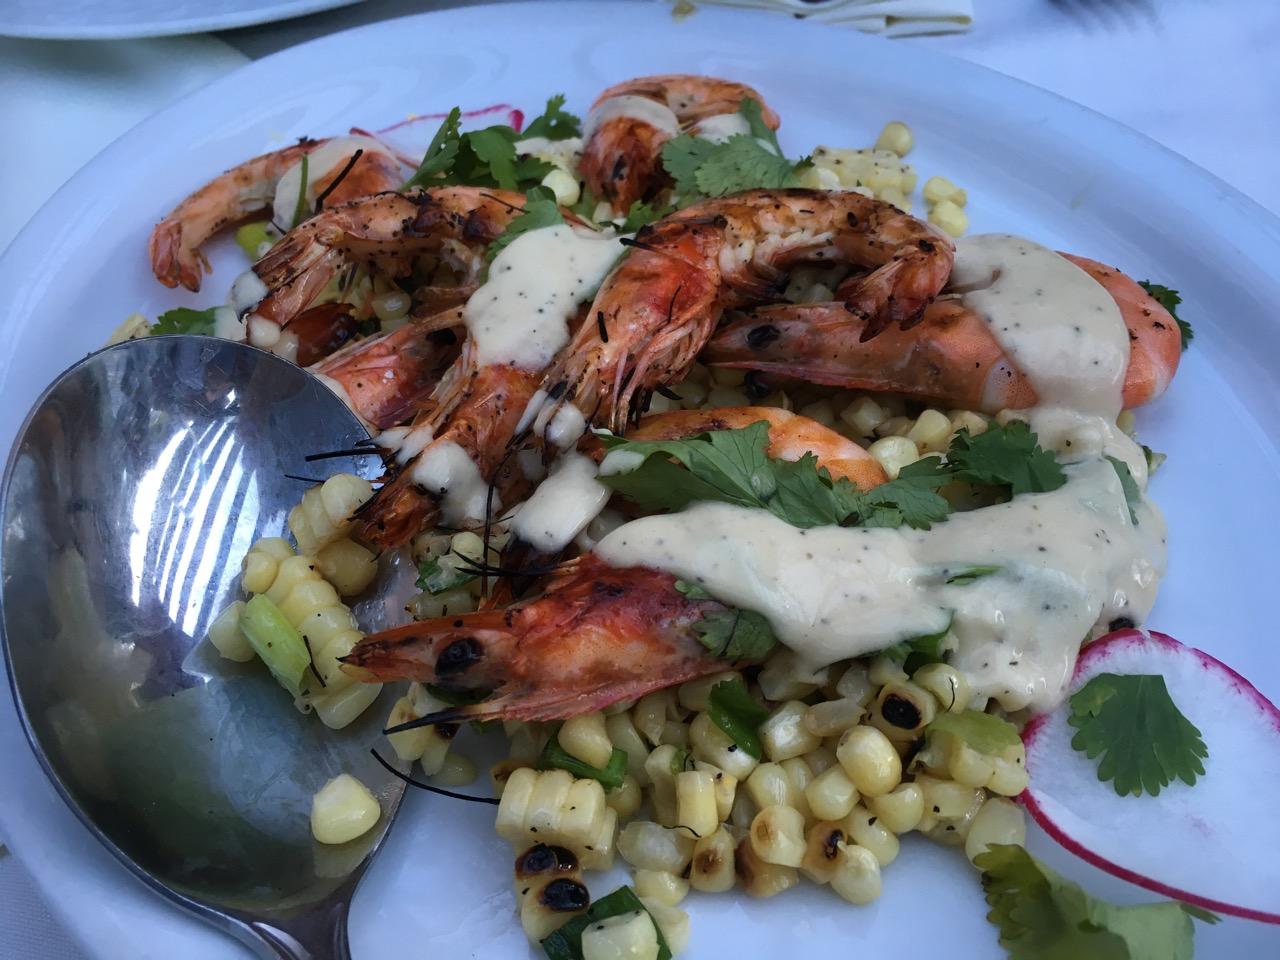 Crawfish_corn_Holman_ranch